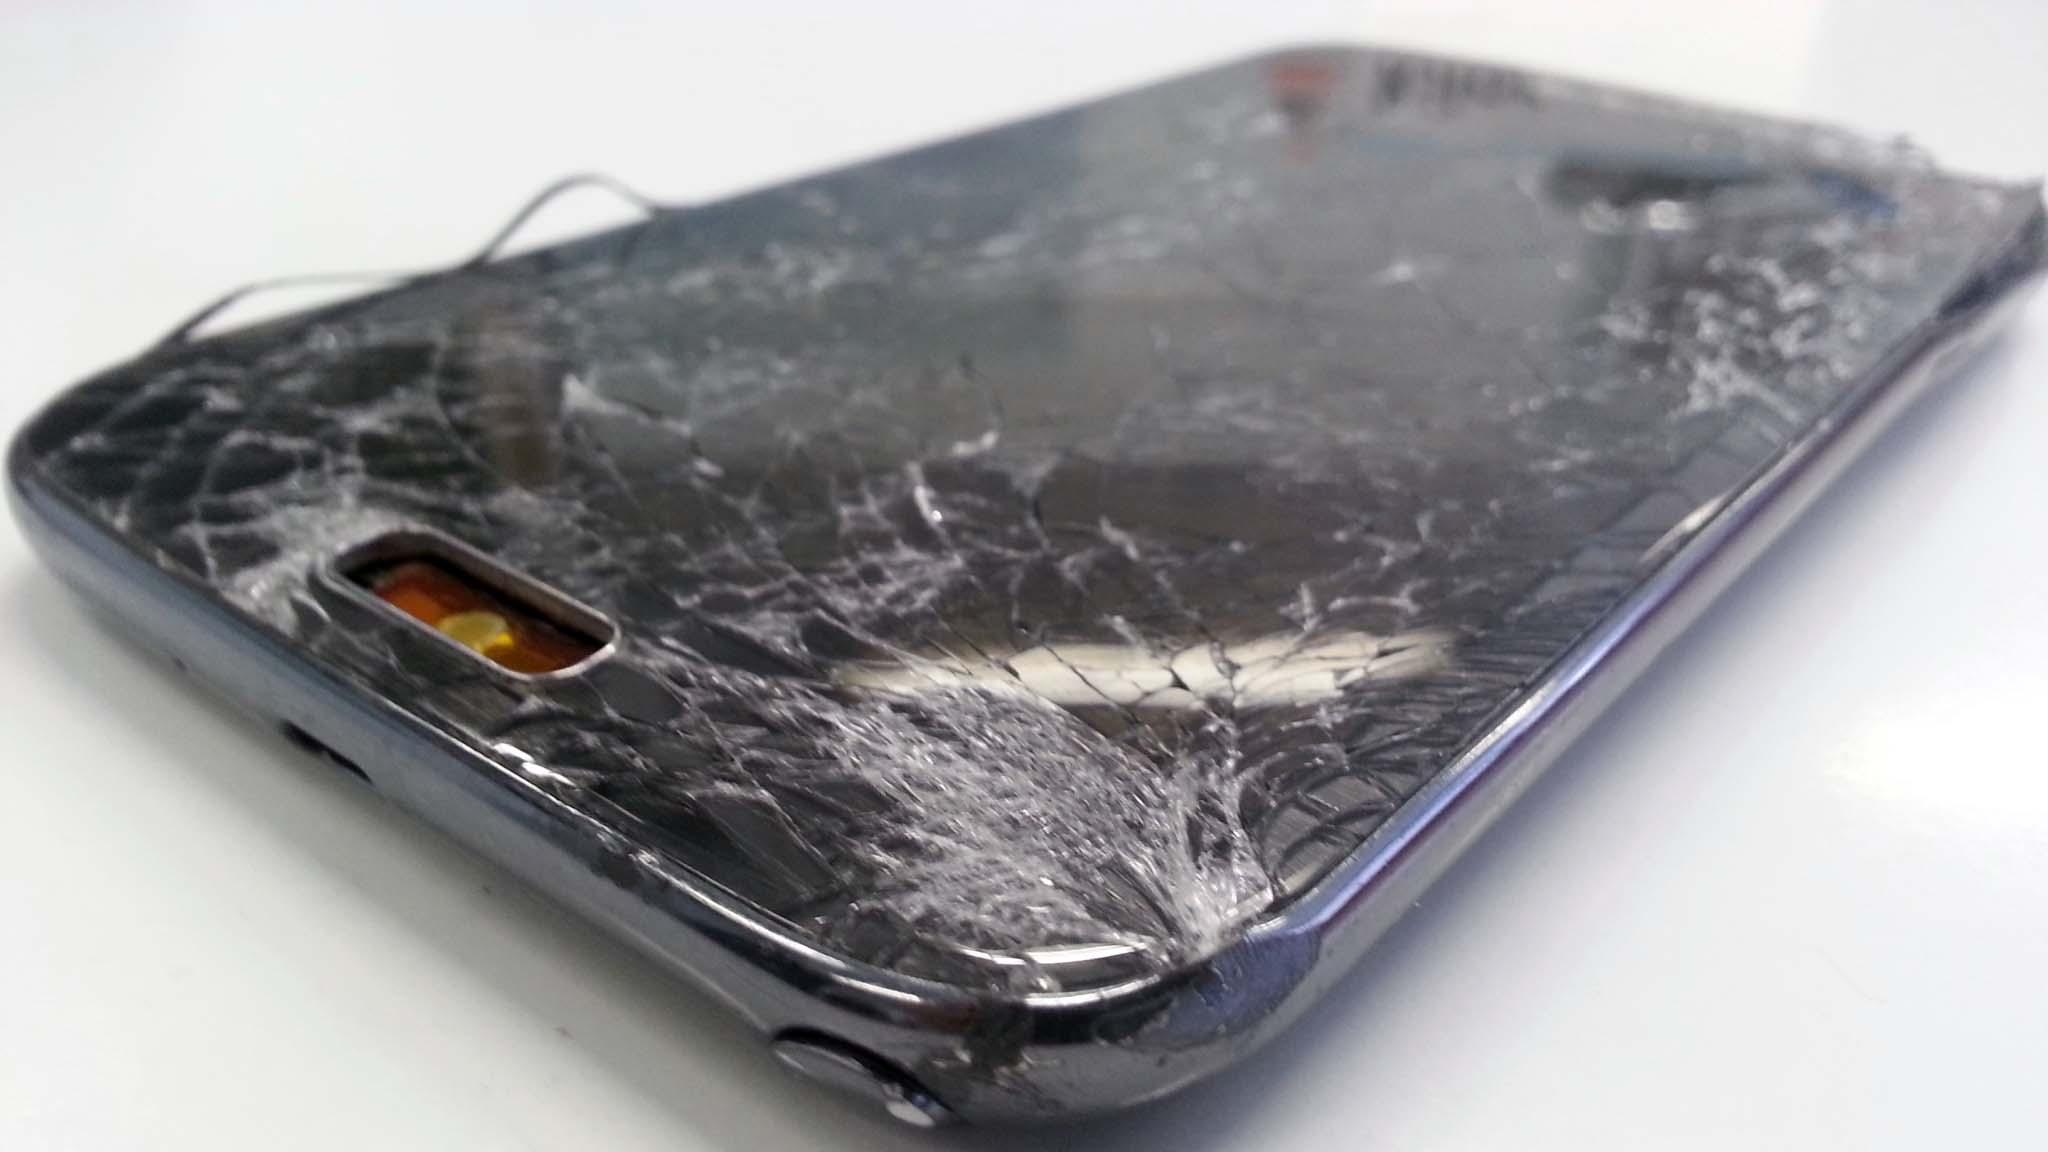 ¿Necesitas cambiar la pantalla rota de tu móvil?